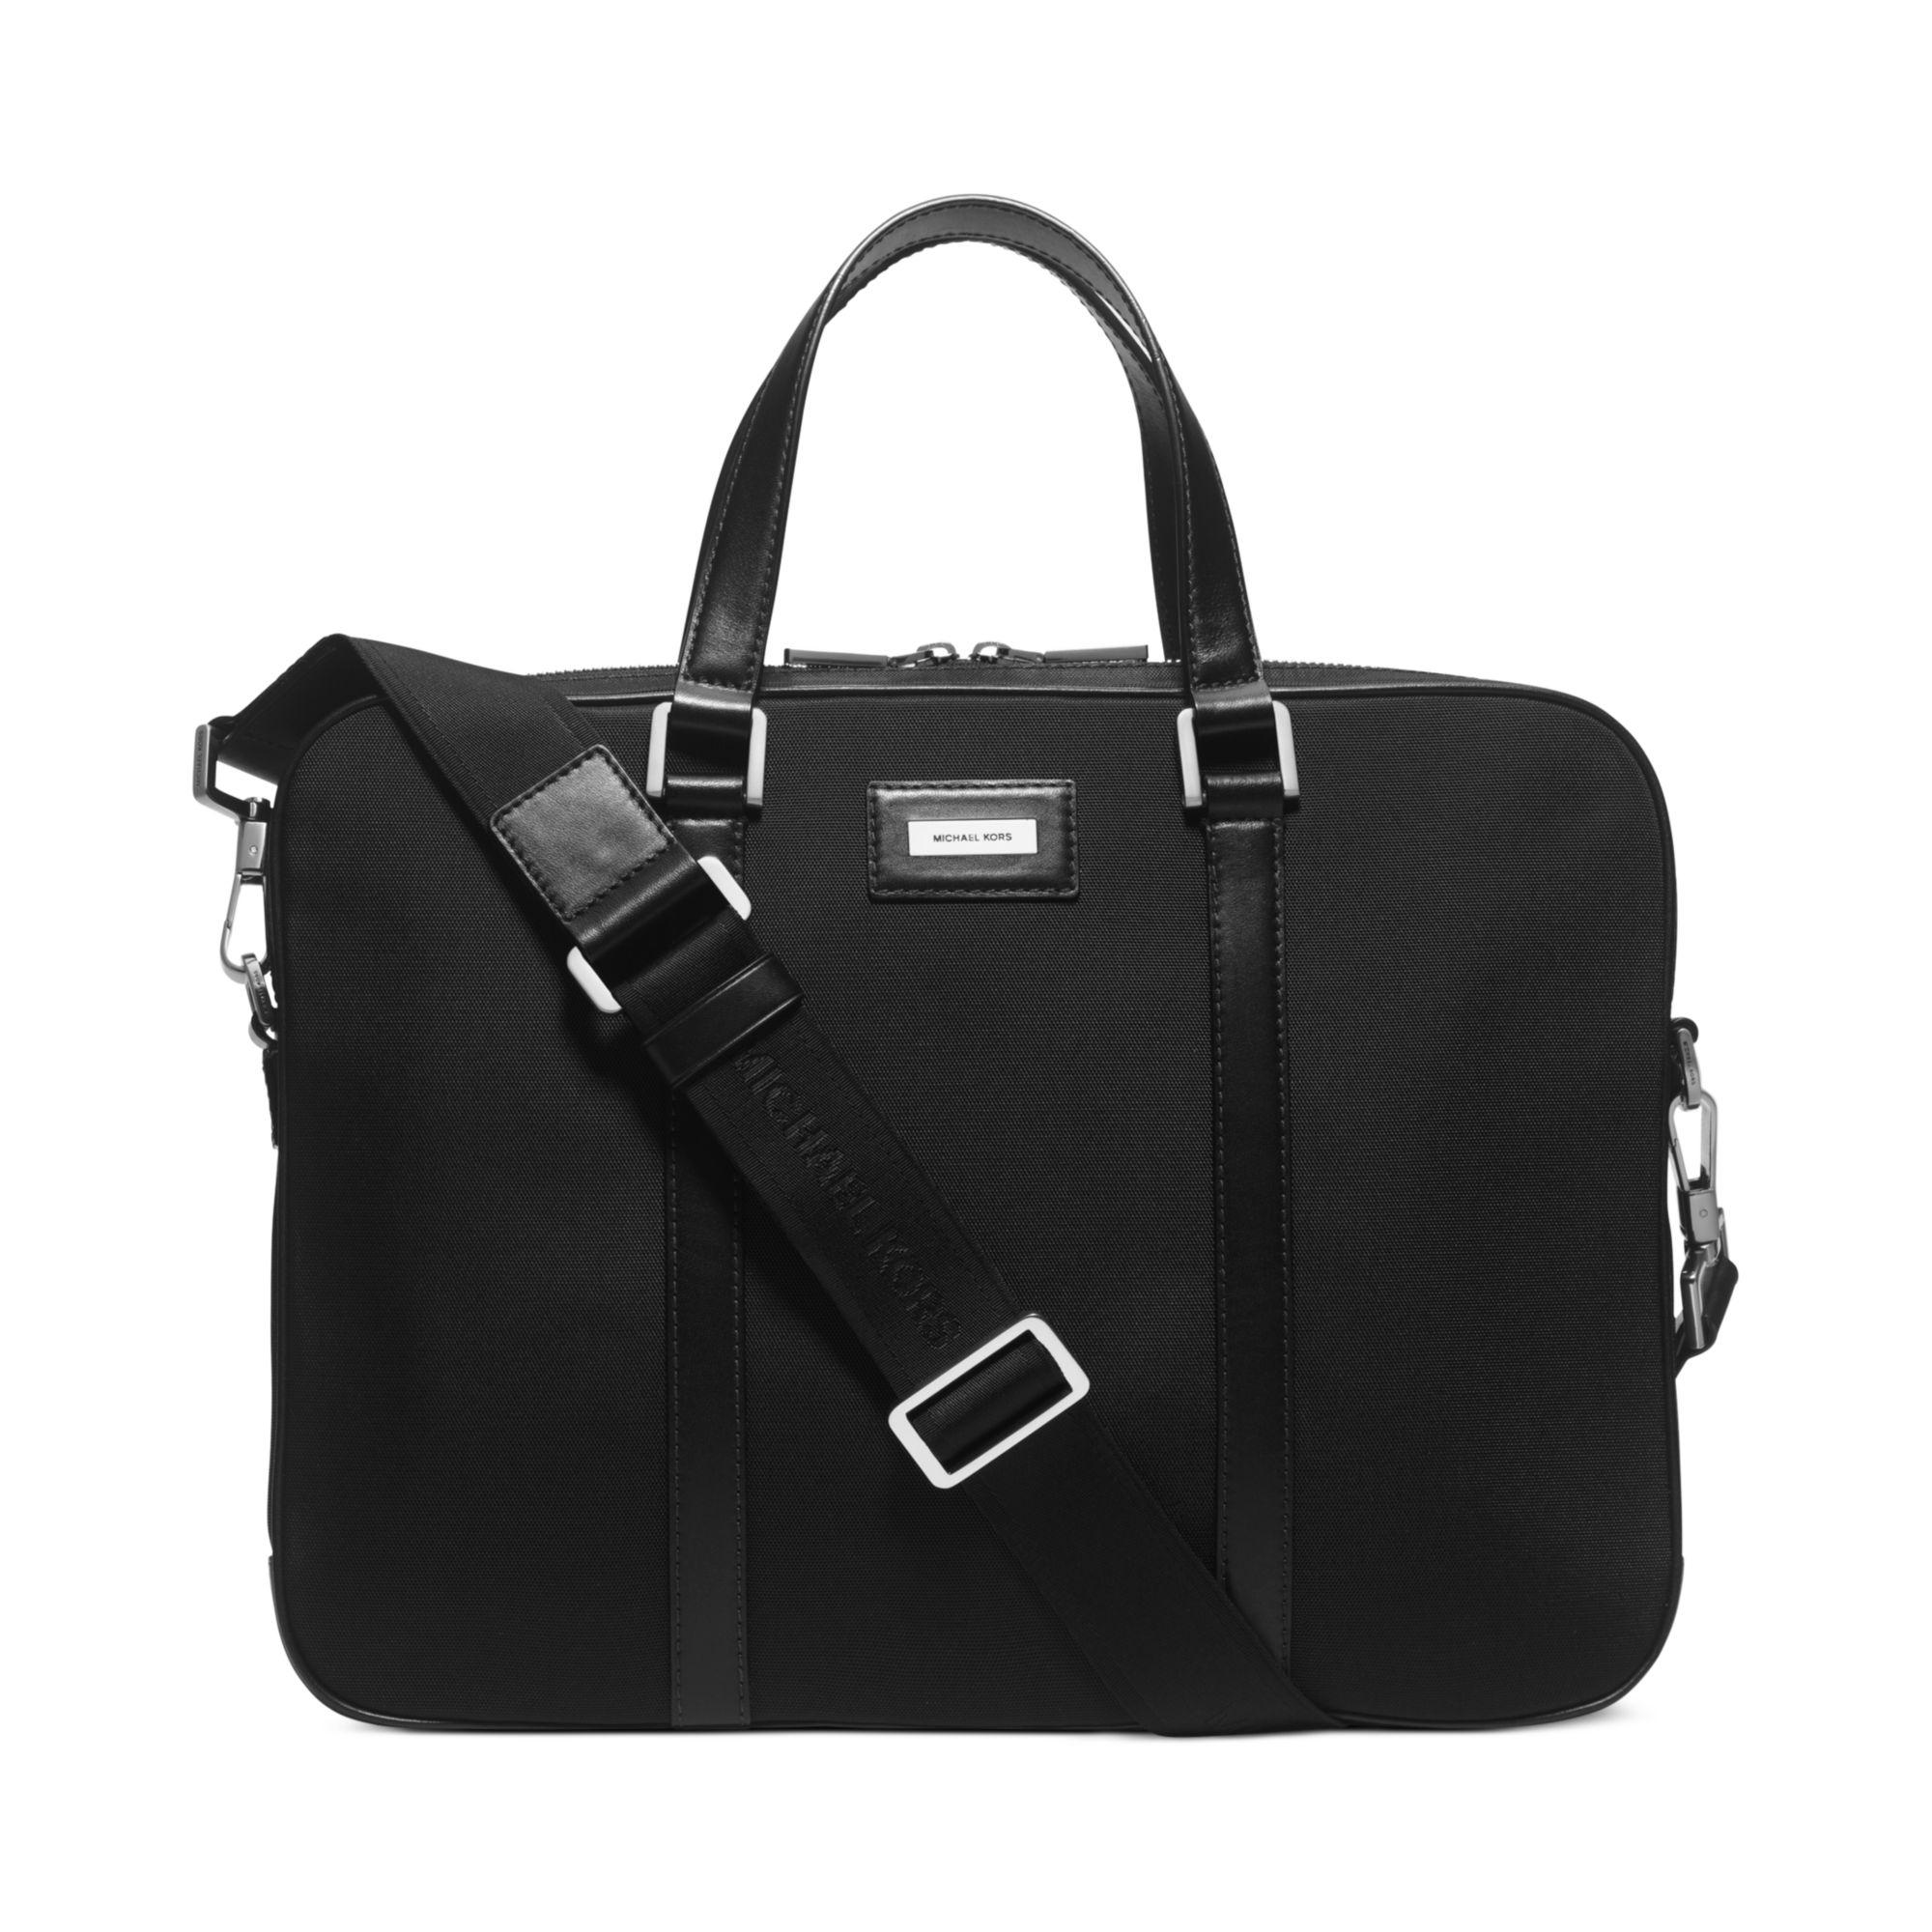 c2a2288ab Lyst - Michael Kors Windsor Slim Briefcase in Black for Men